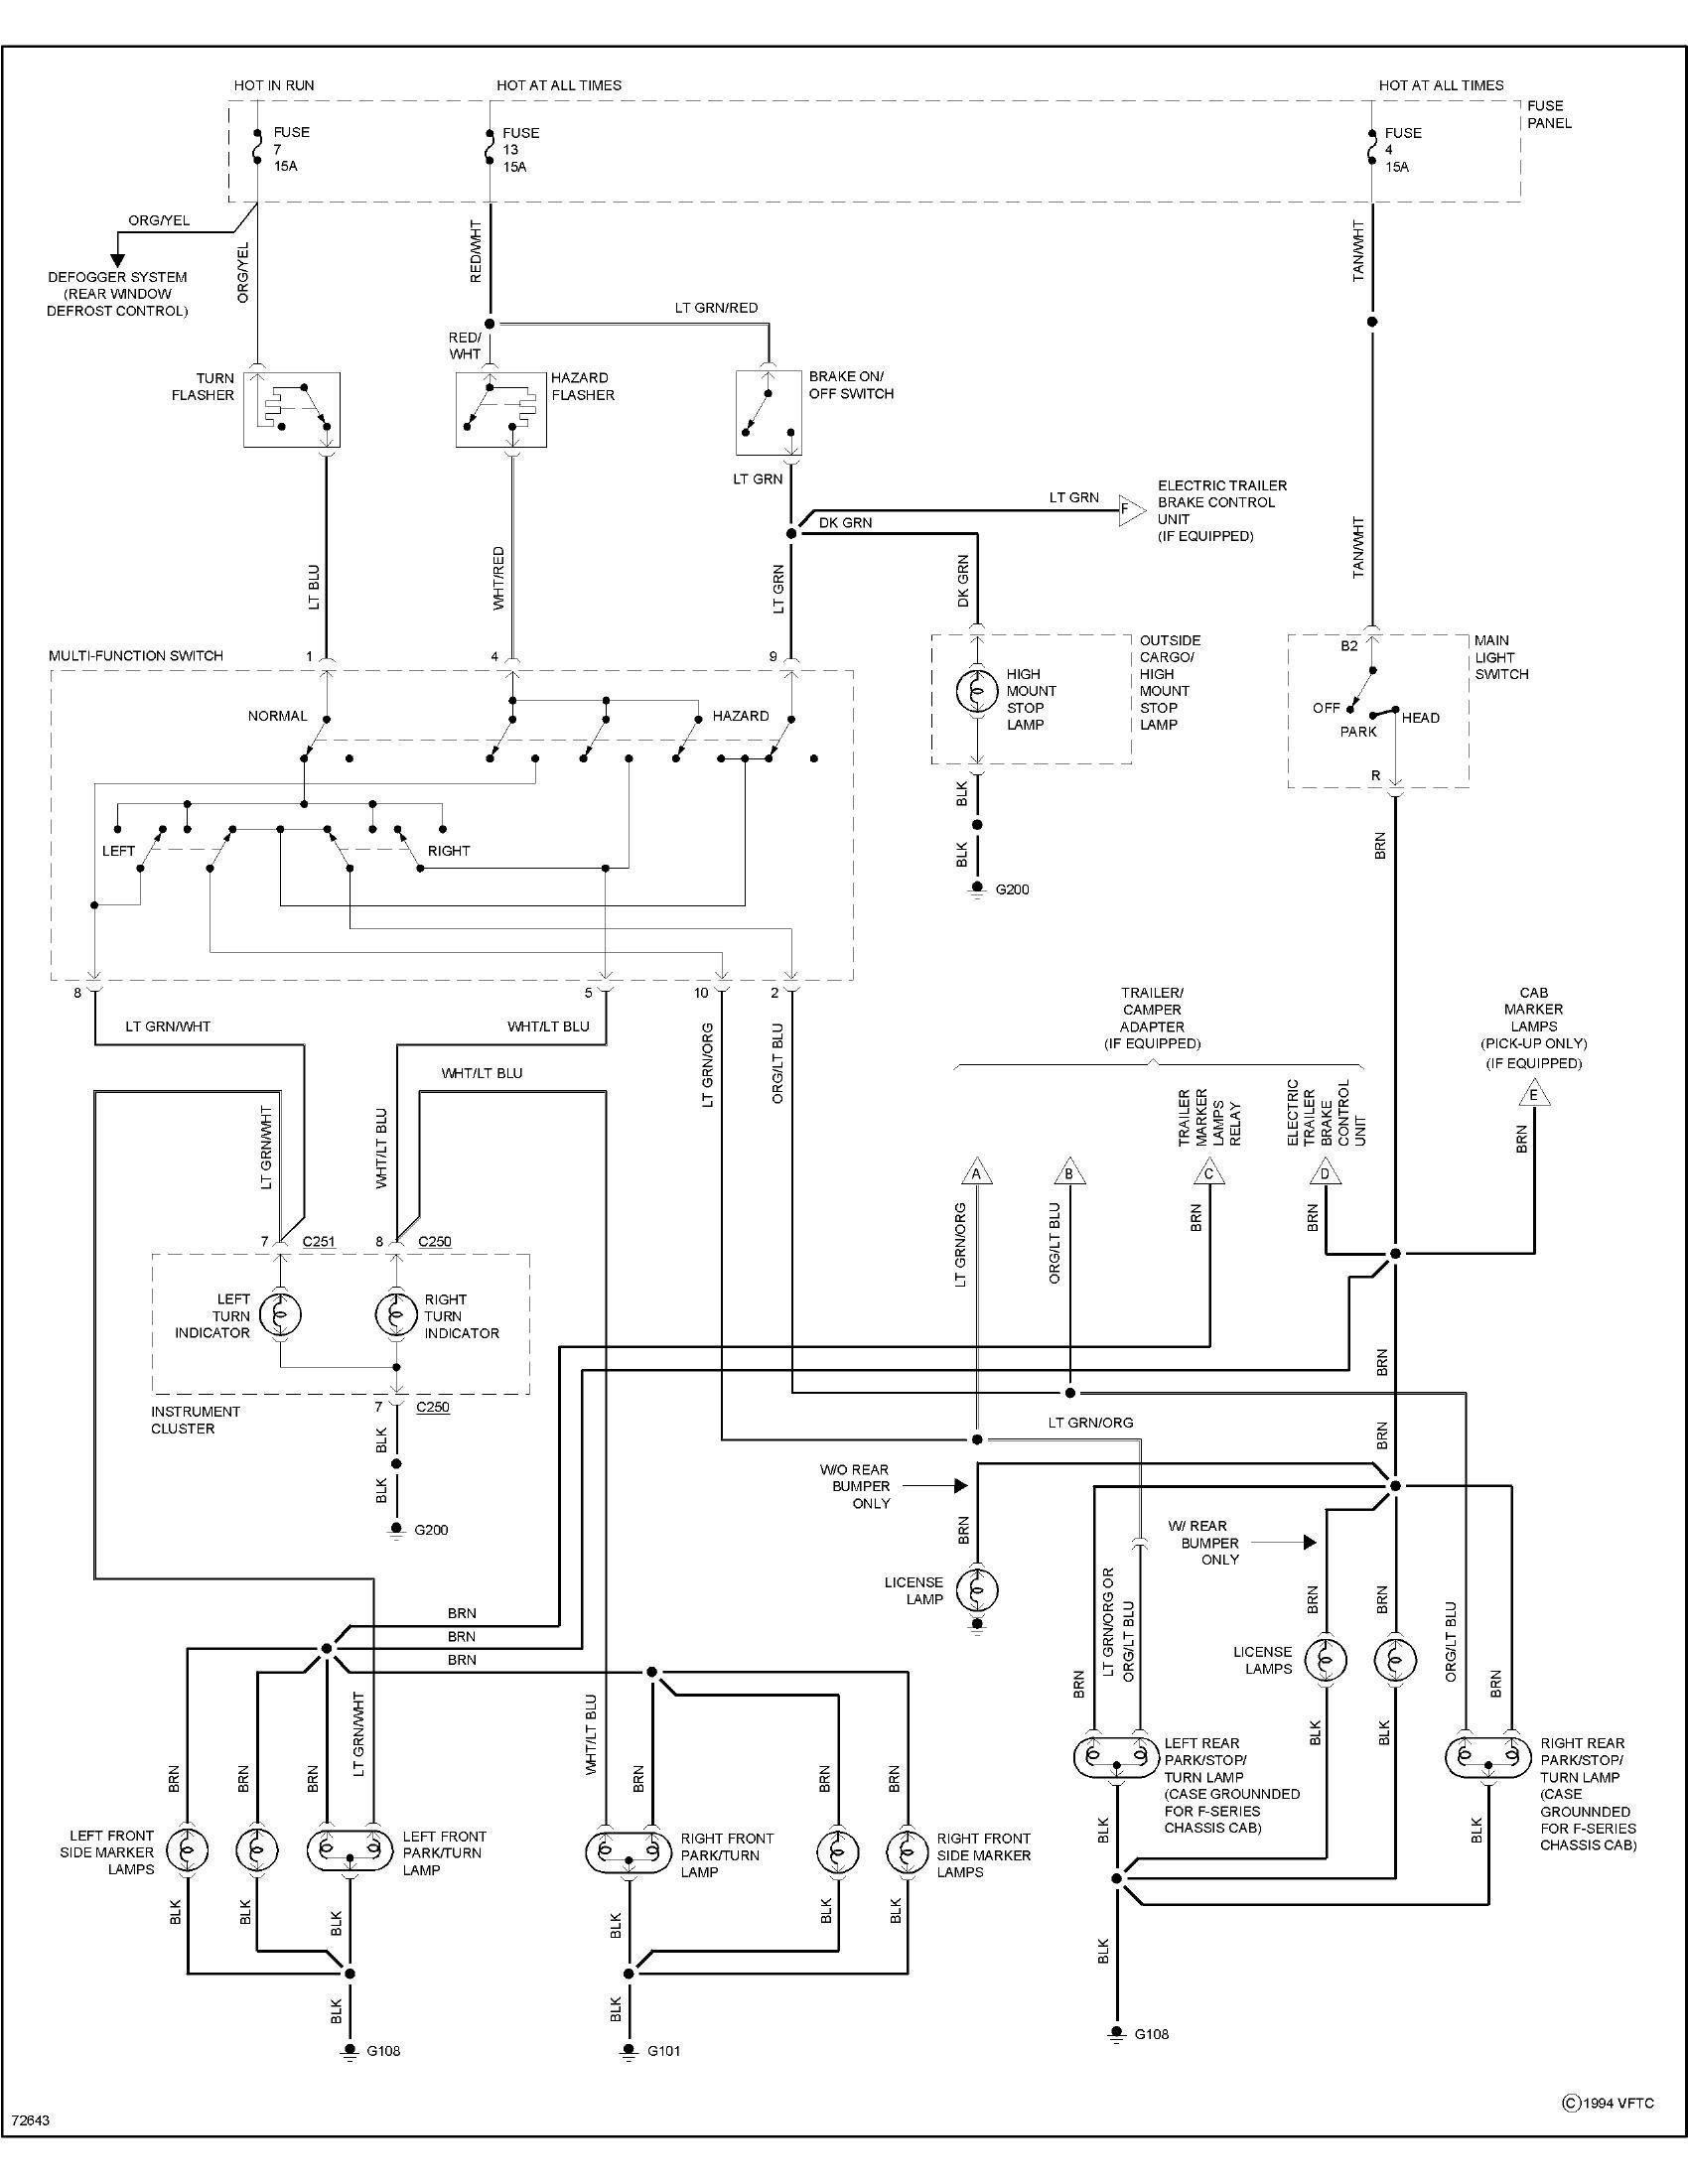 Panther Wiring Diagram 95 Infiniti I35 Wiring Diagram For Wiring Diagram Schematics